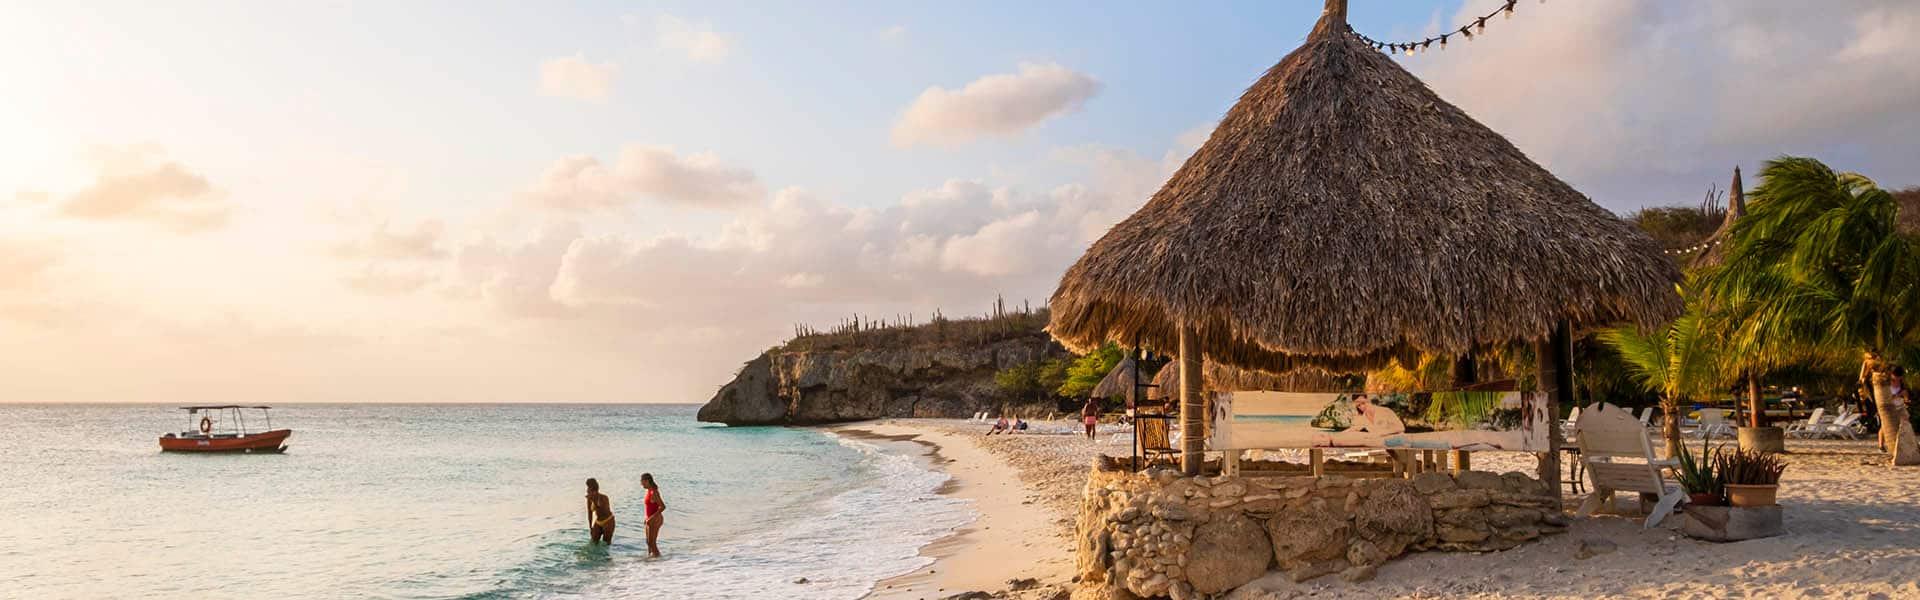 Reise in die Karibik: Curaçao, Aruba und Dominikanische Republik